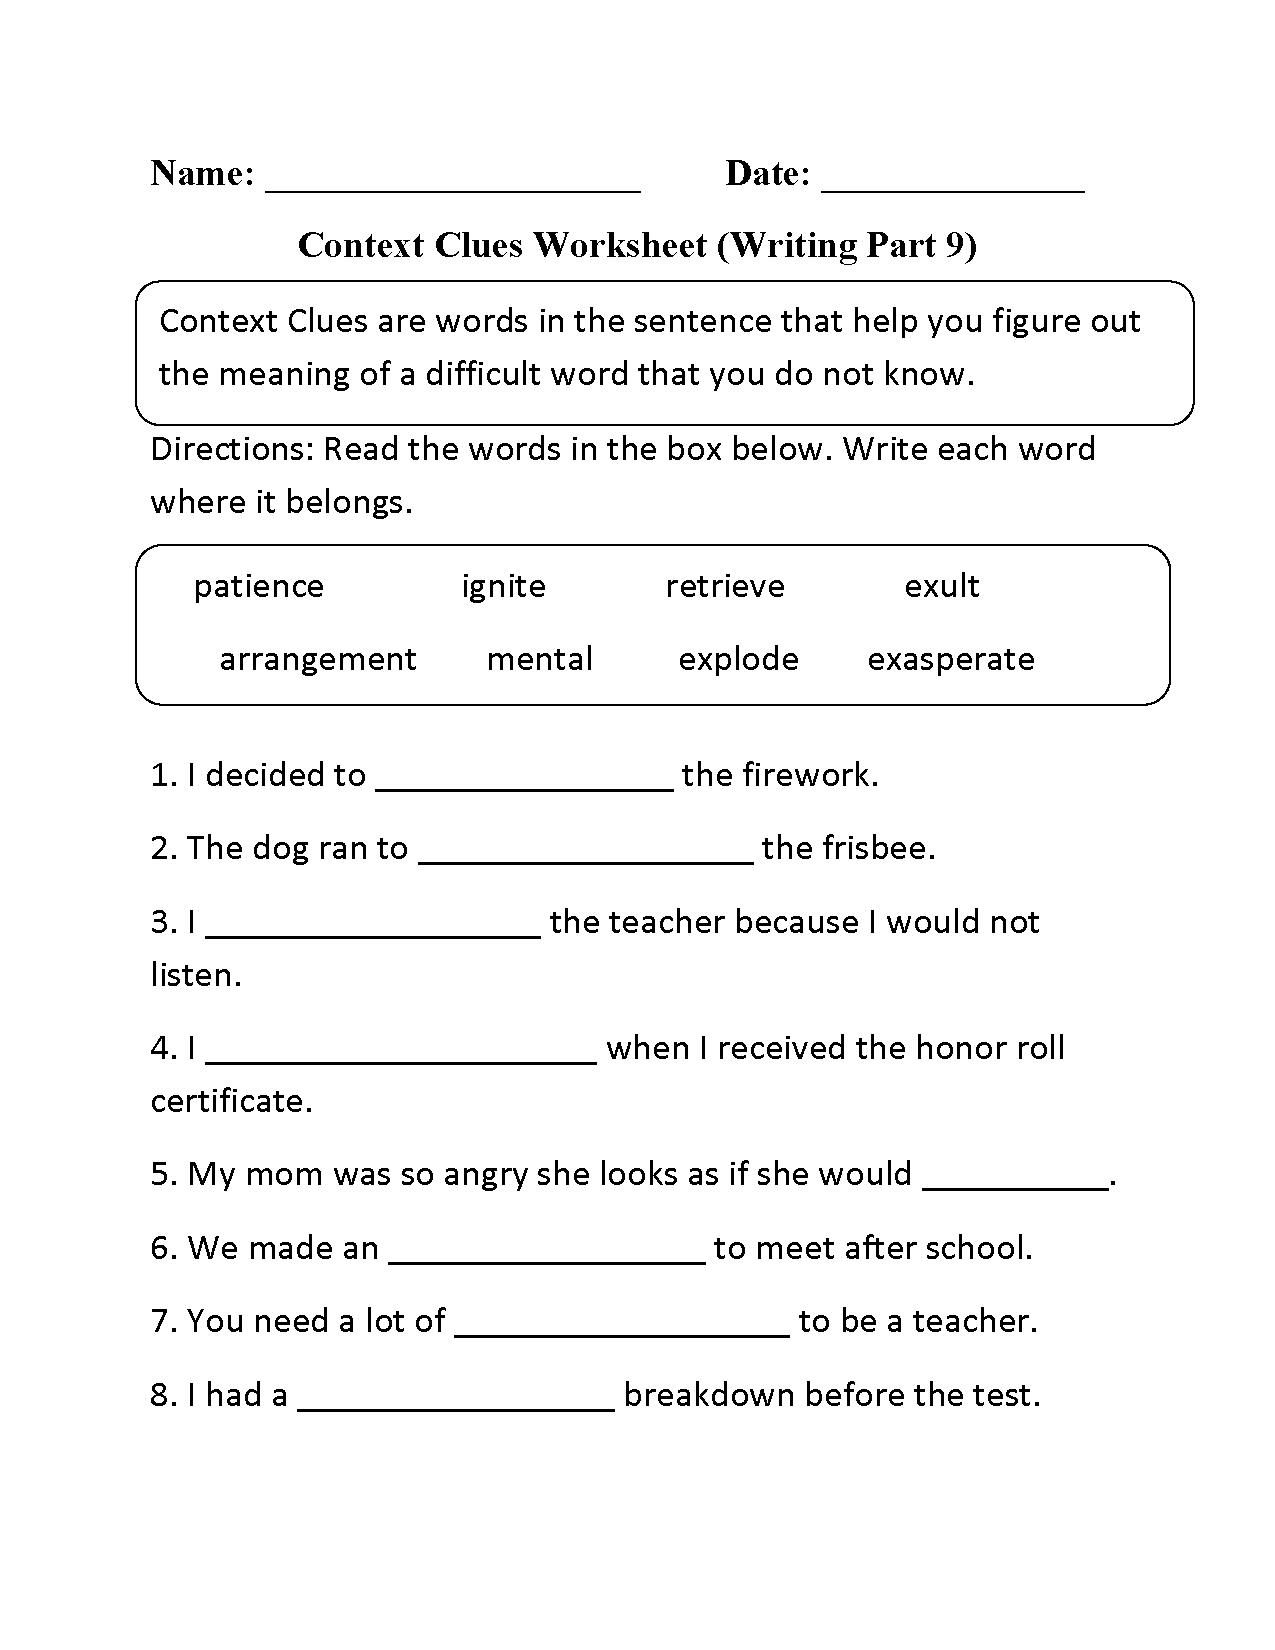 hight resolution of Englishlinx.com   Context Clues Worksheets   Context clues worksheets